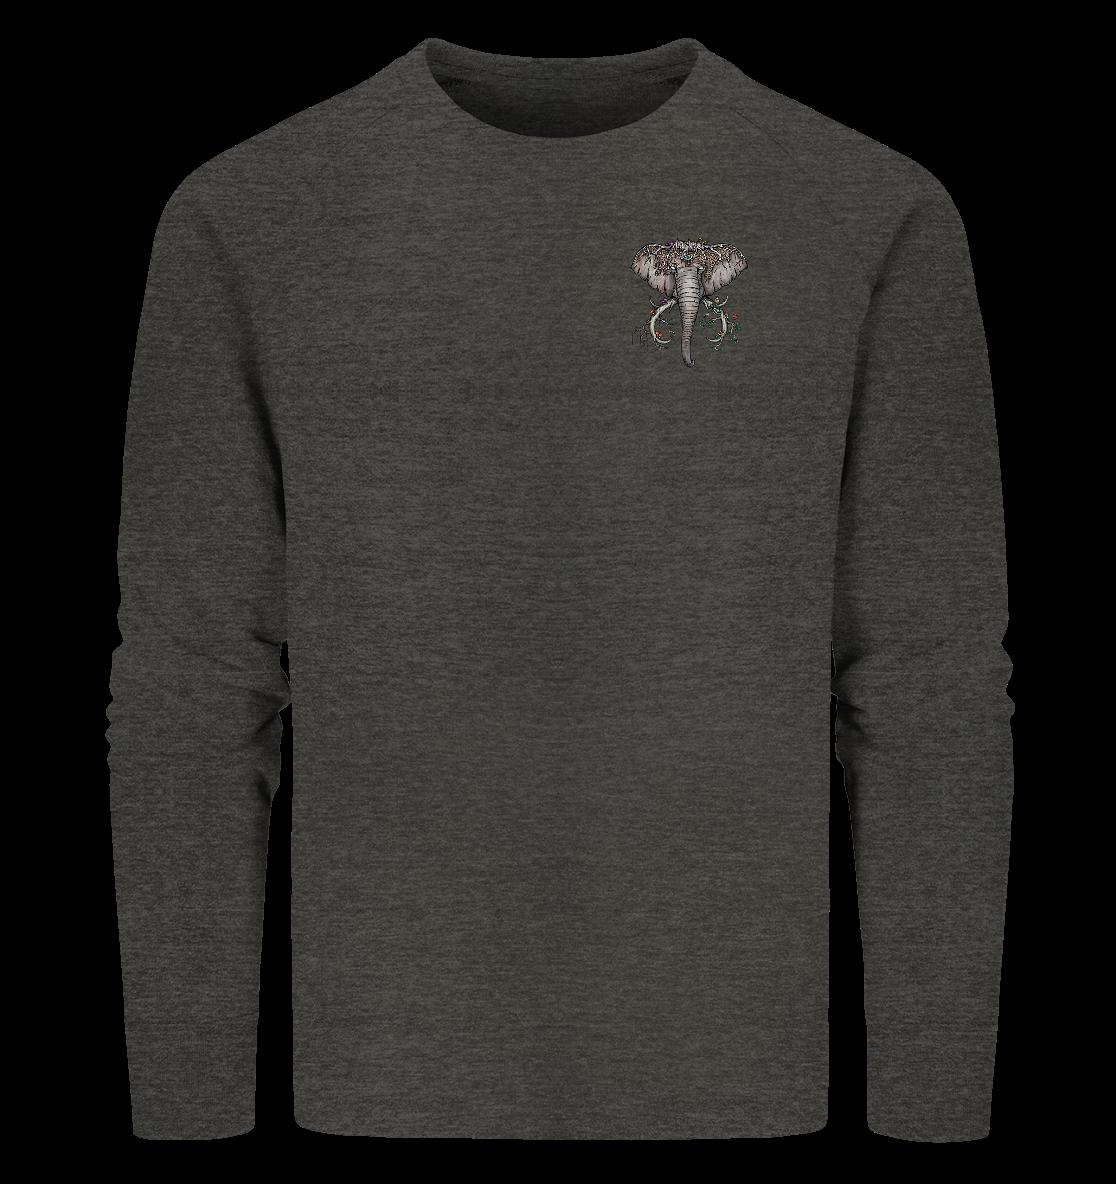 front-organic-sweatshirt-252625-1116x-1.png